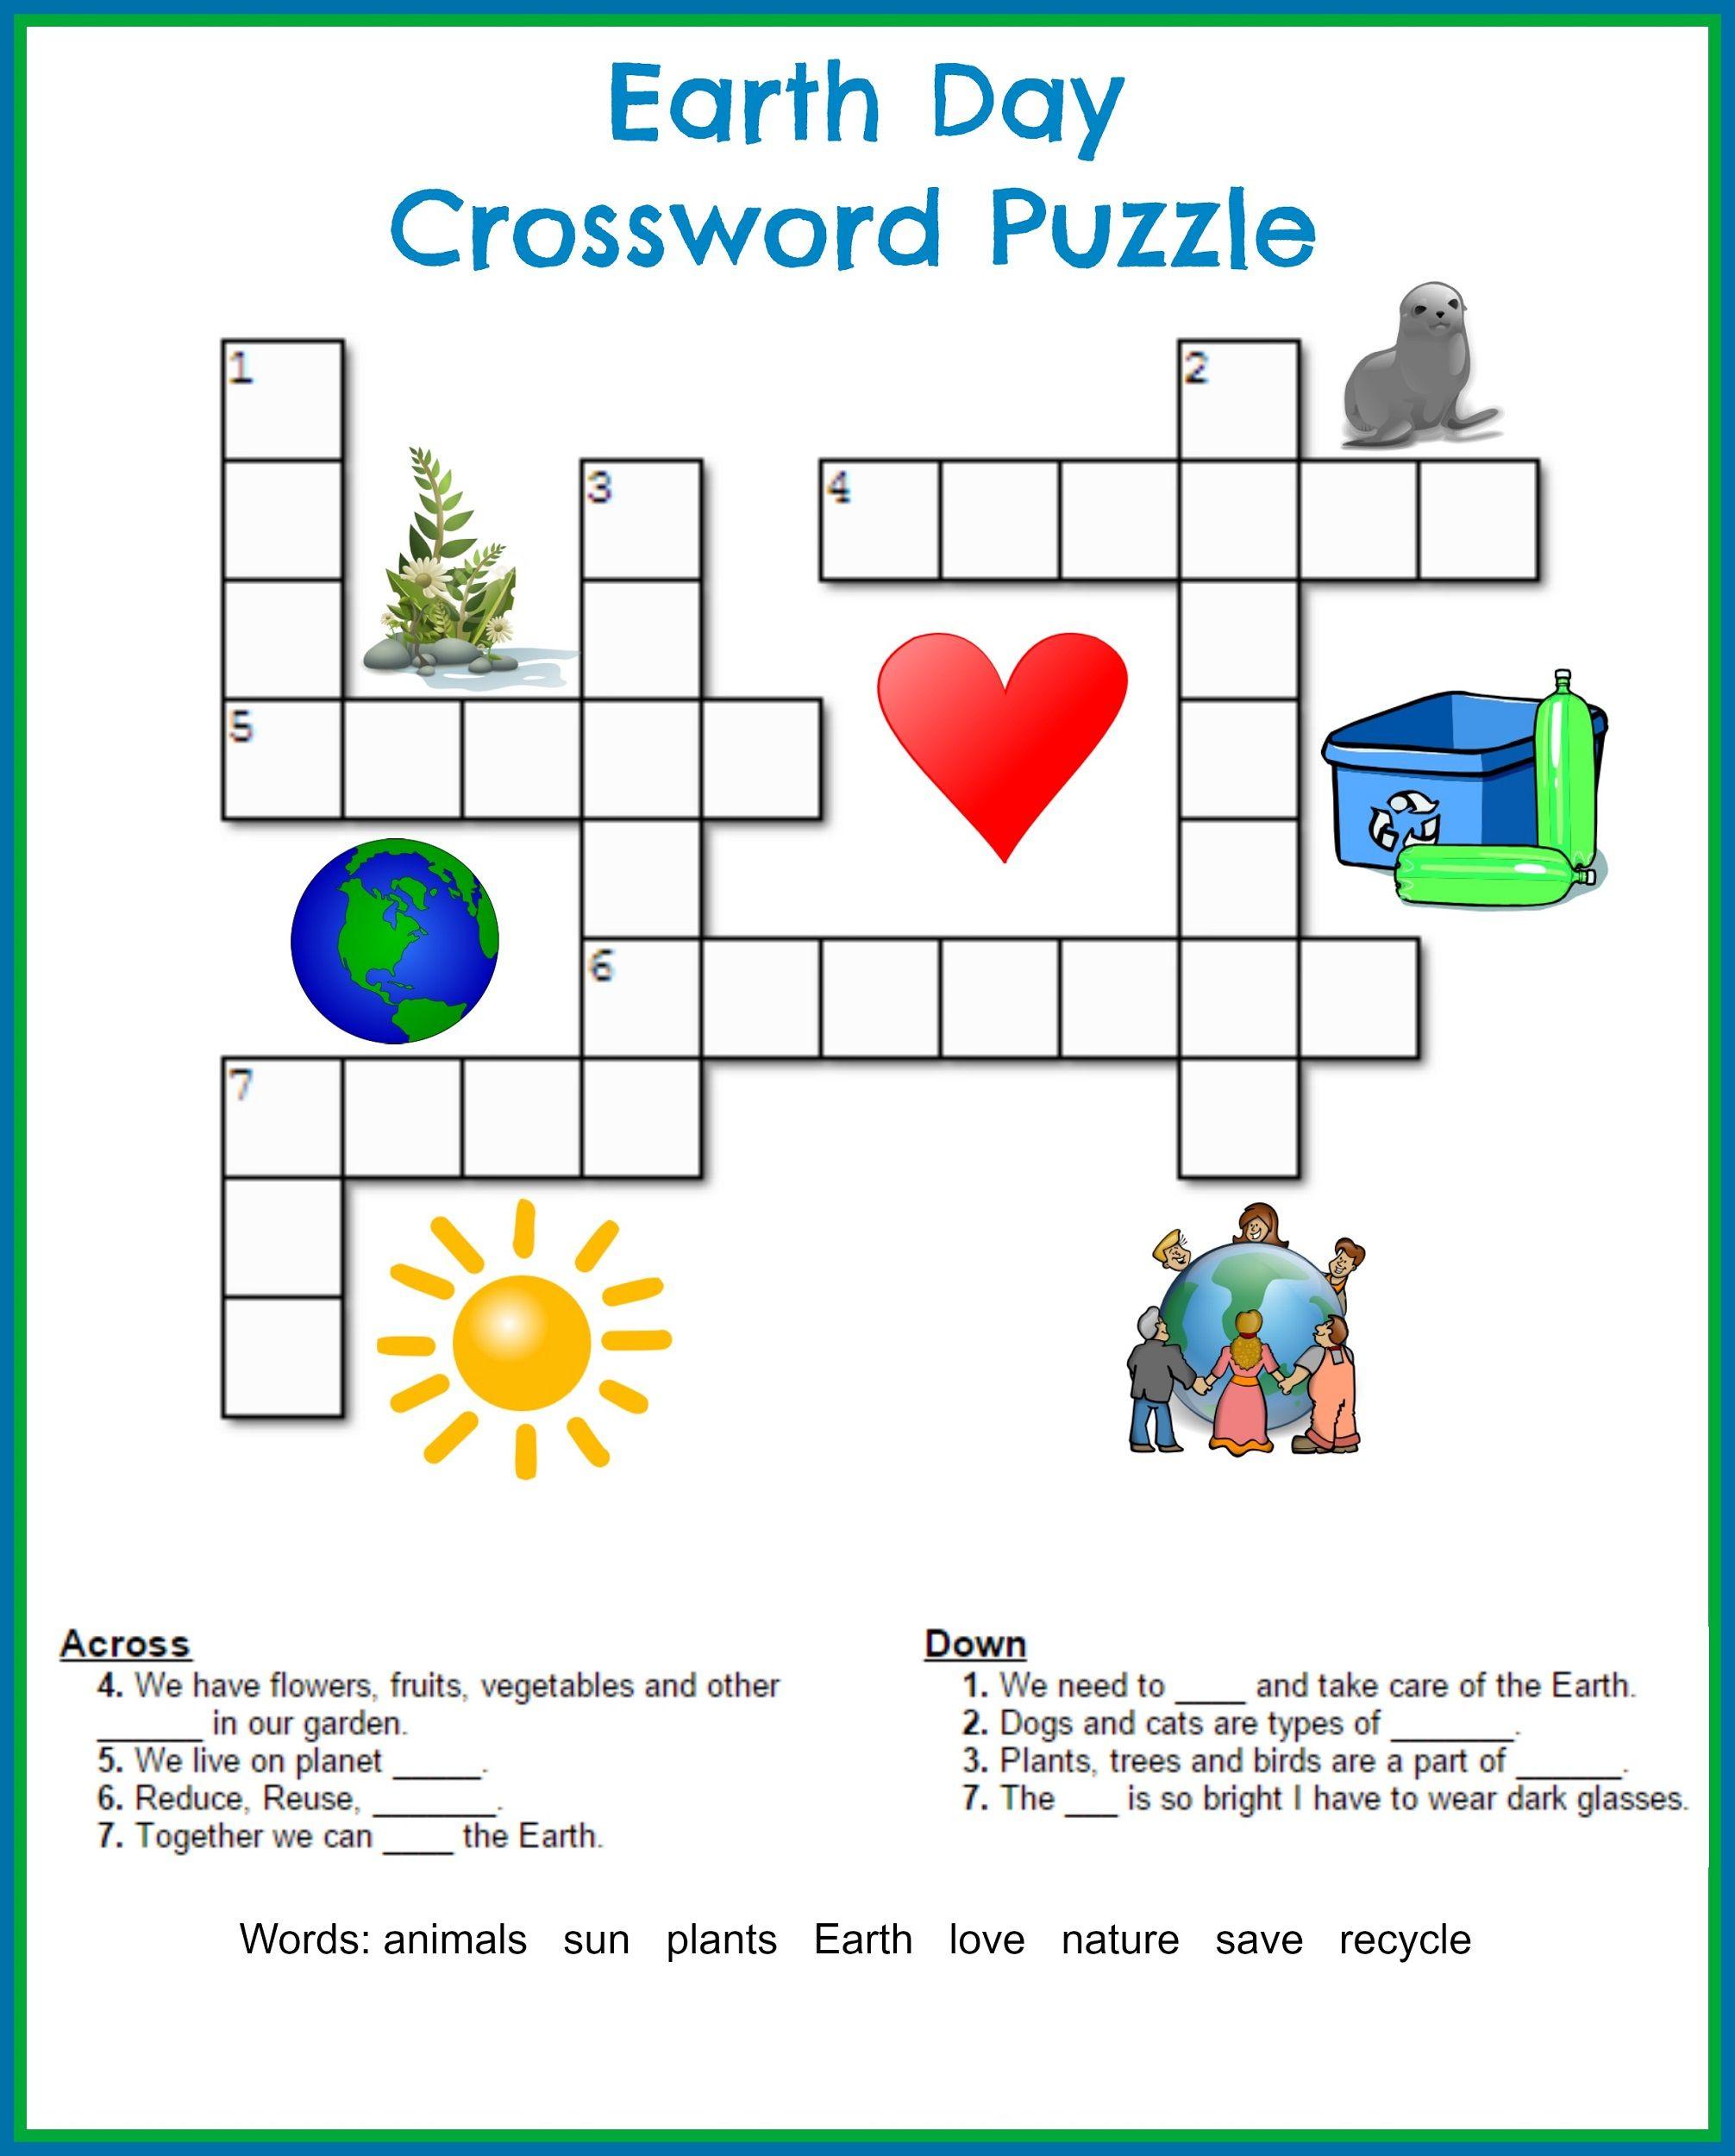 Printable Crossword Puzzles Kids | Crossword Puzzles On Earth - Printable Puzzles For Kids